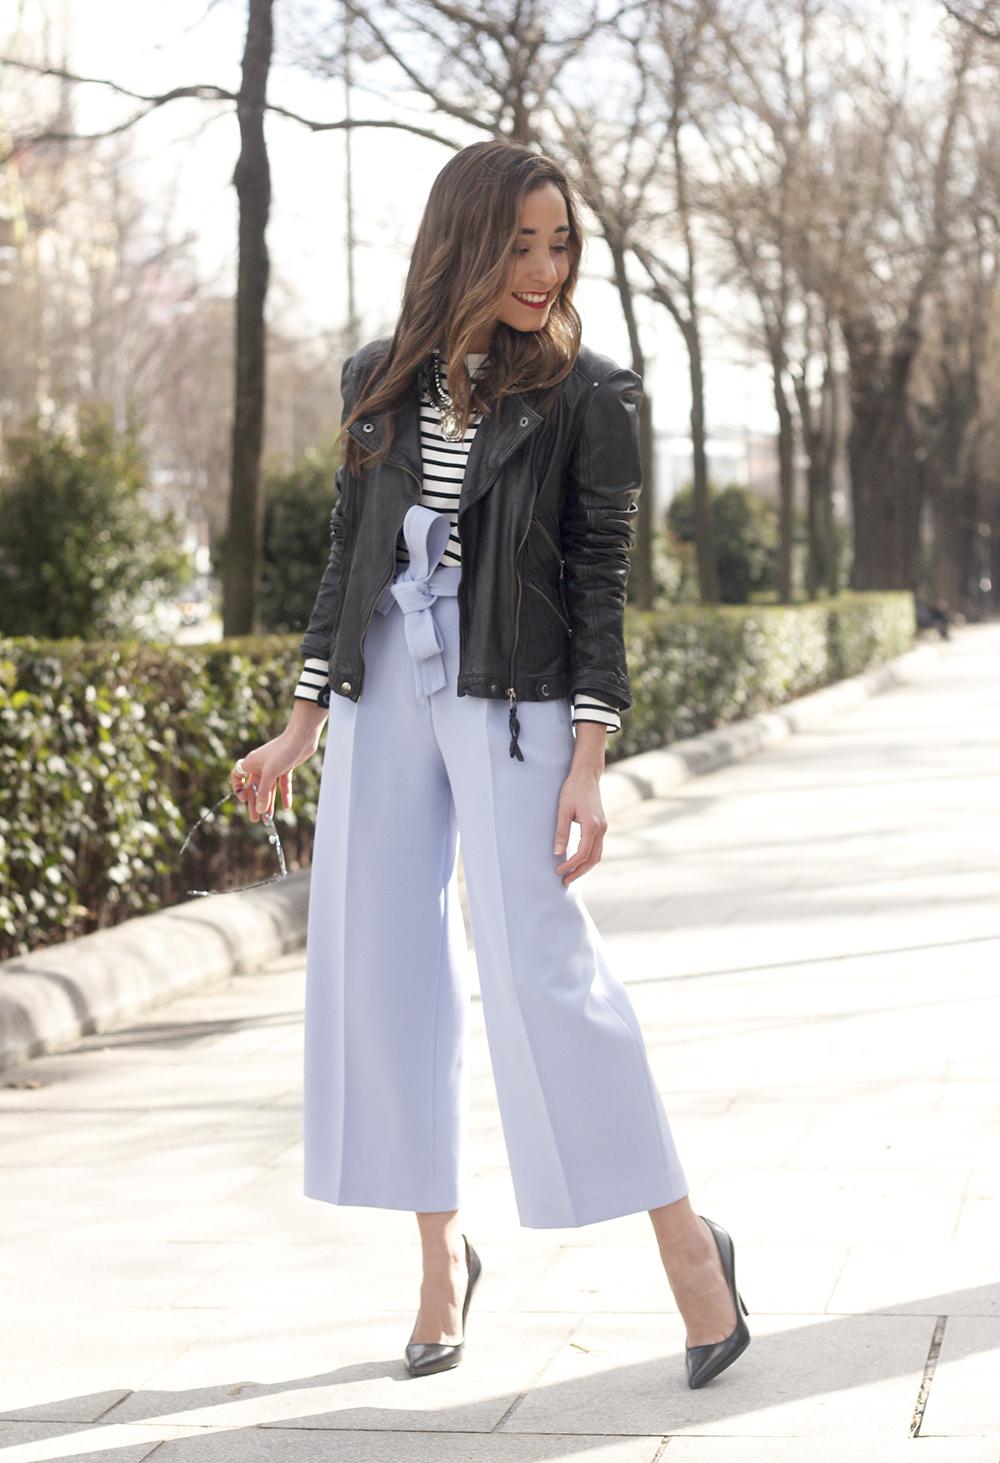 Light Blue Pallazzo pants t-shirt stripes black heels biker jacket dior so real sunglasses outfit style fashion05